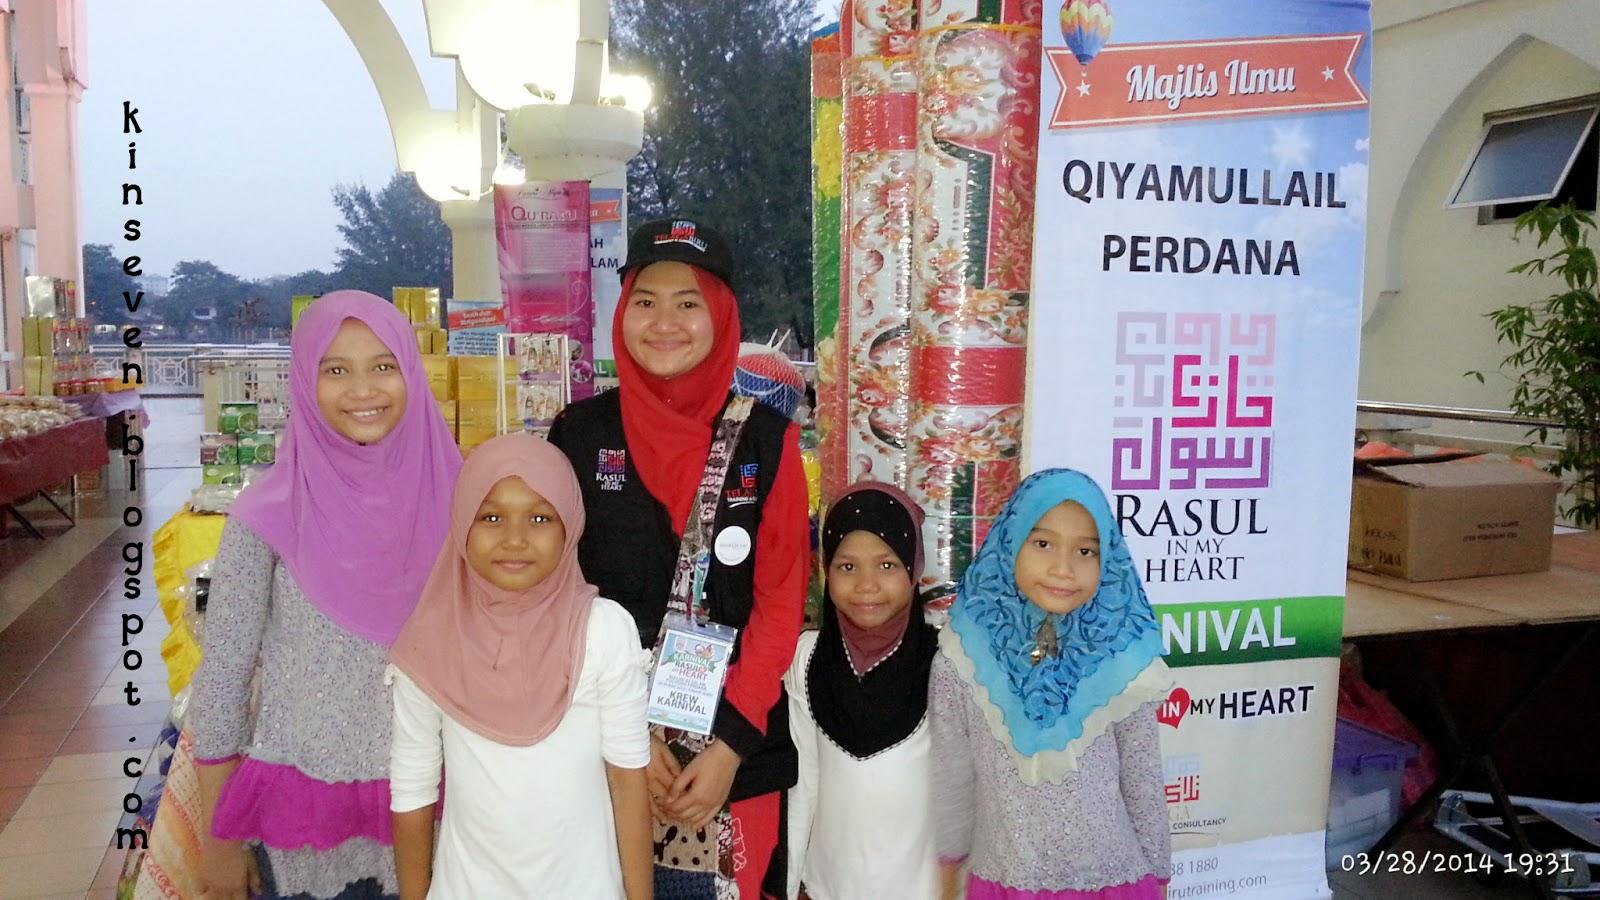 karnival rasul in my heart, masjid As Salam Puchong Perdana